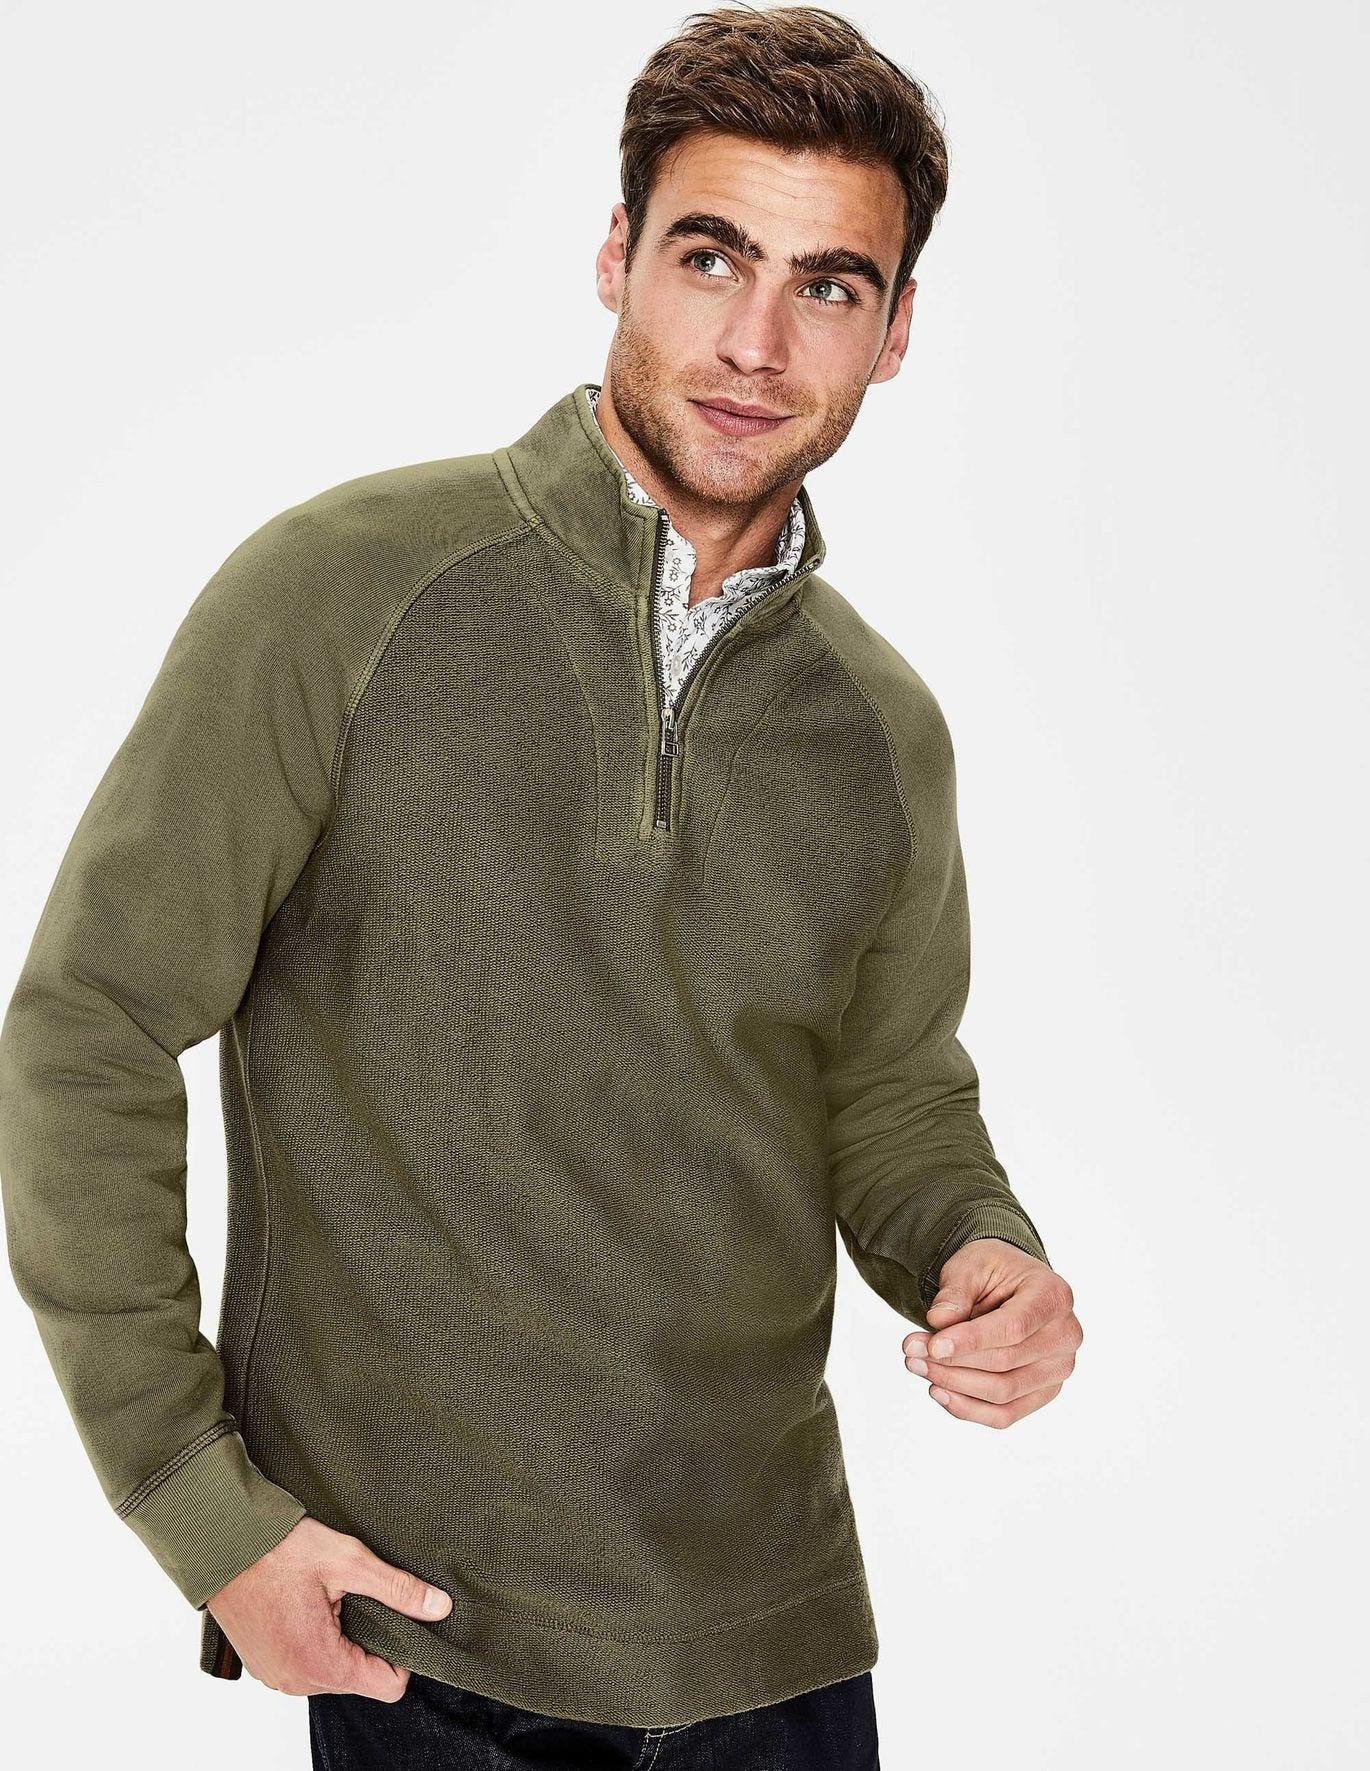 Mallory Garment-Dyed Half-Zip - Khaki